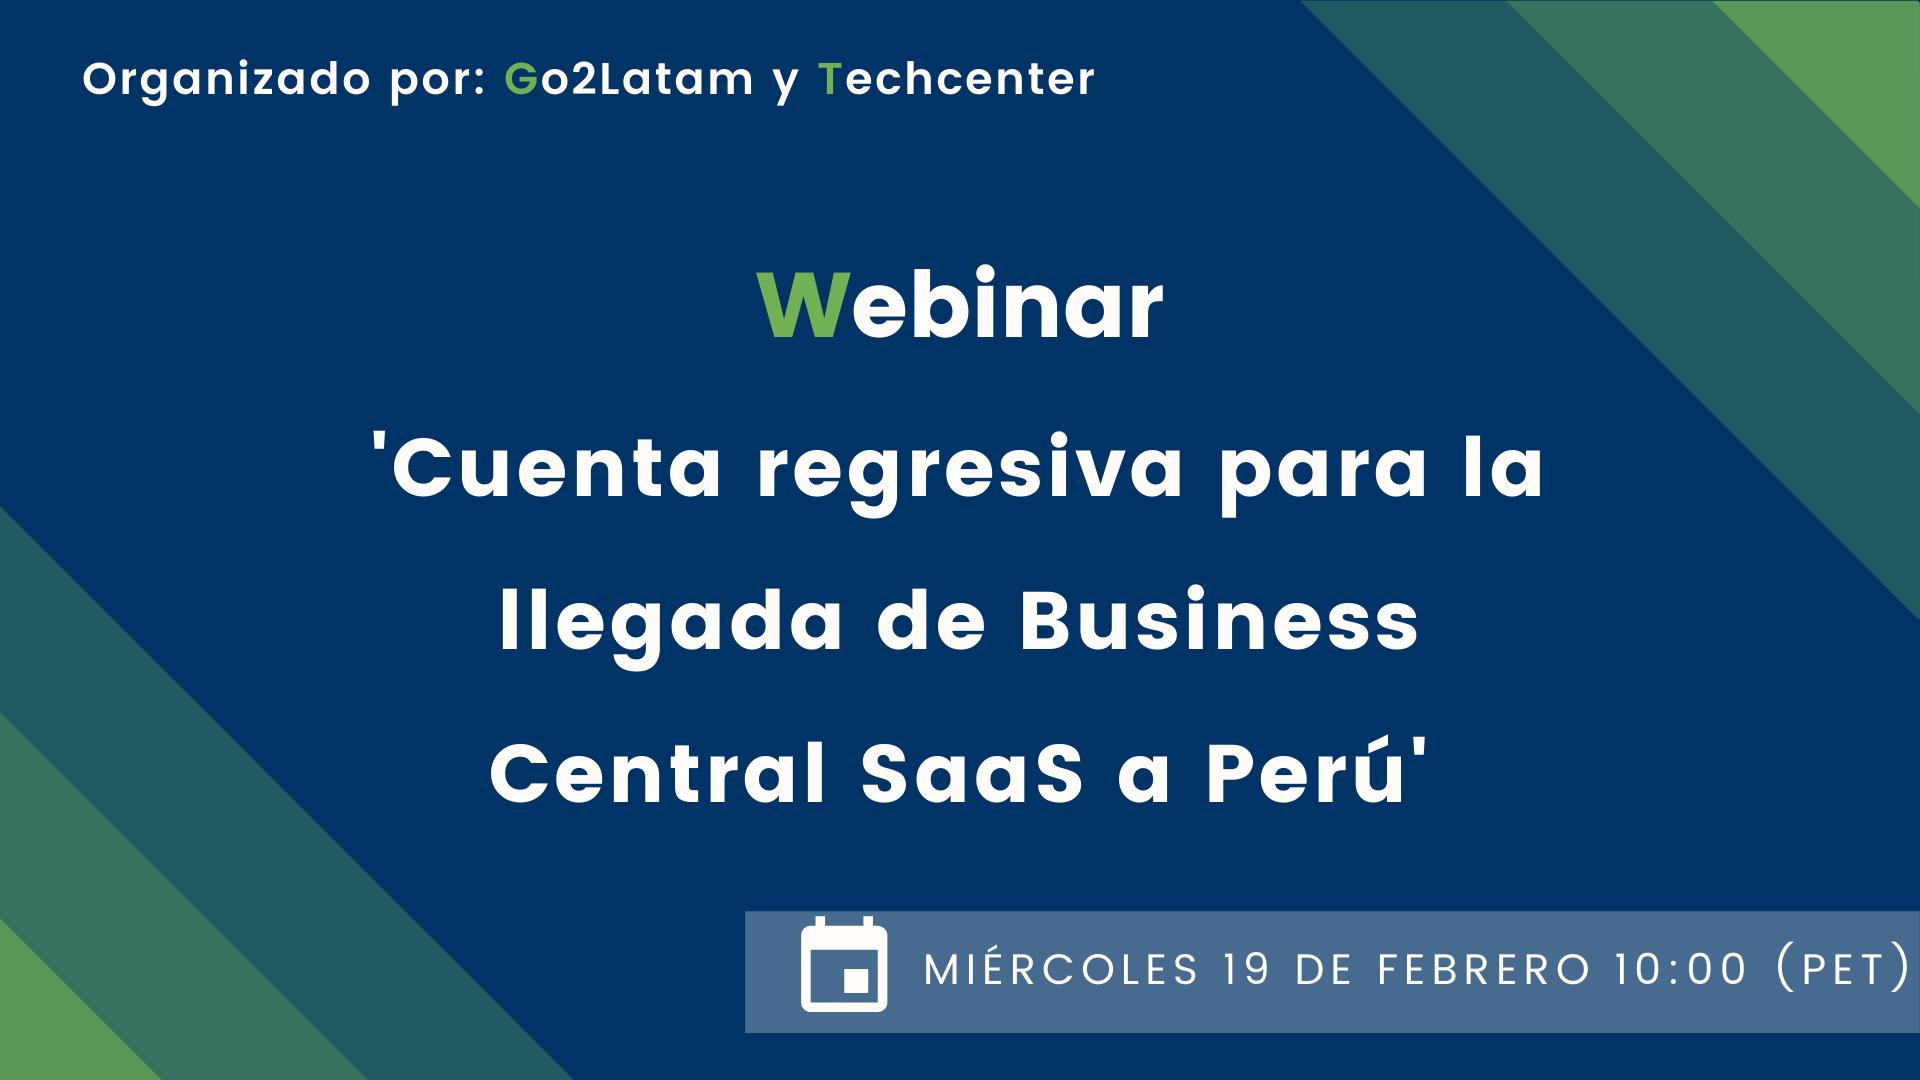 Business Central SaaS Perú